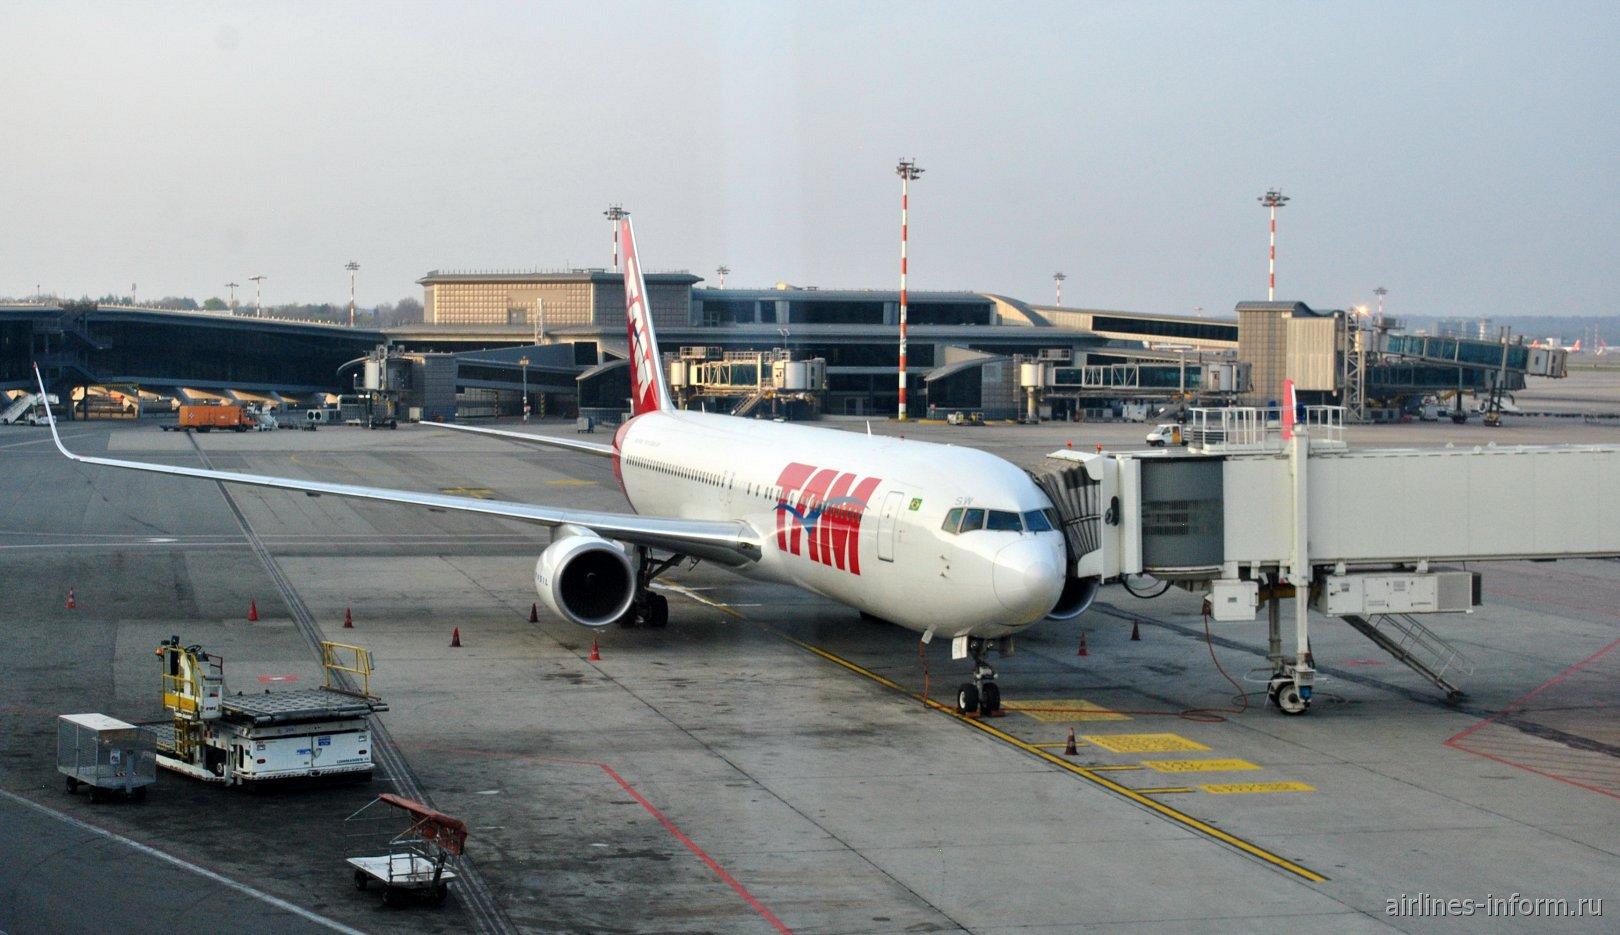 Боинг-767-300 (PT-MSW) авиакомпании LATAM Brasil в аэропорту Милан Мальпенса